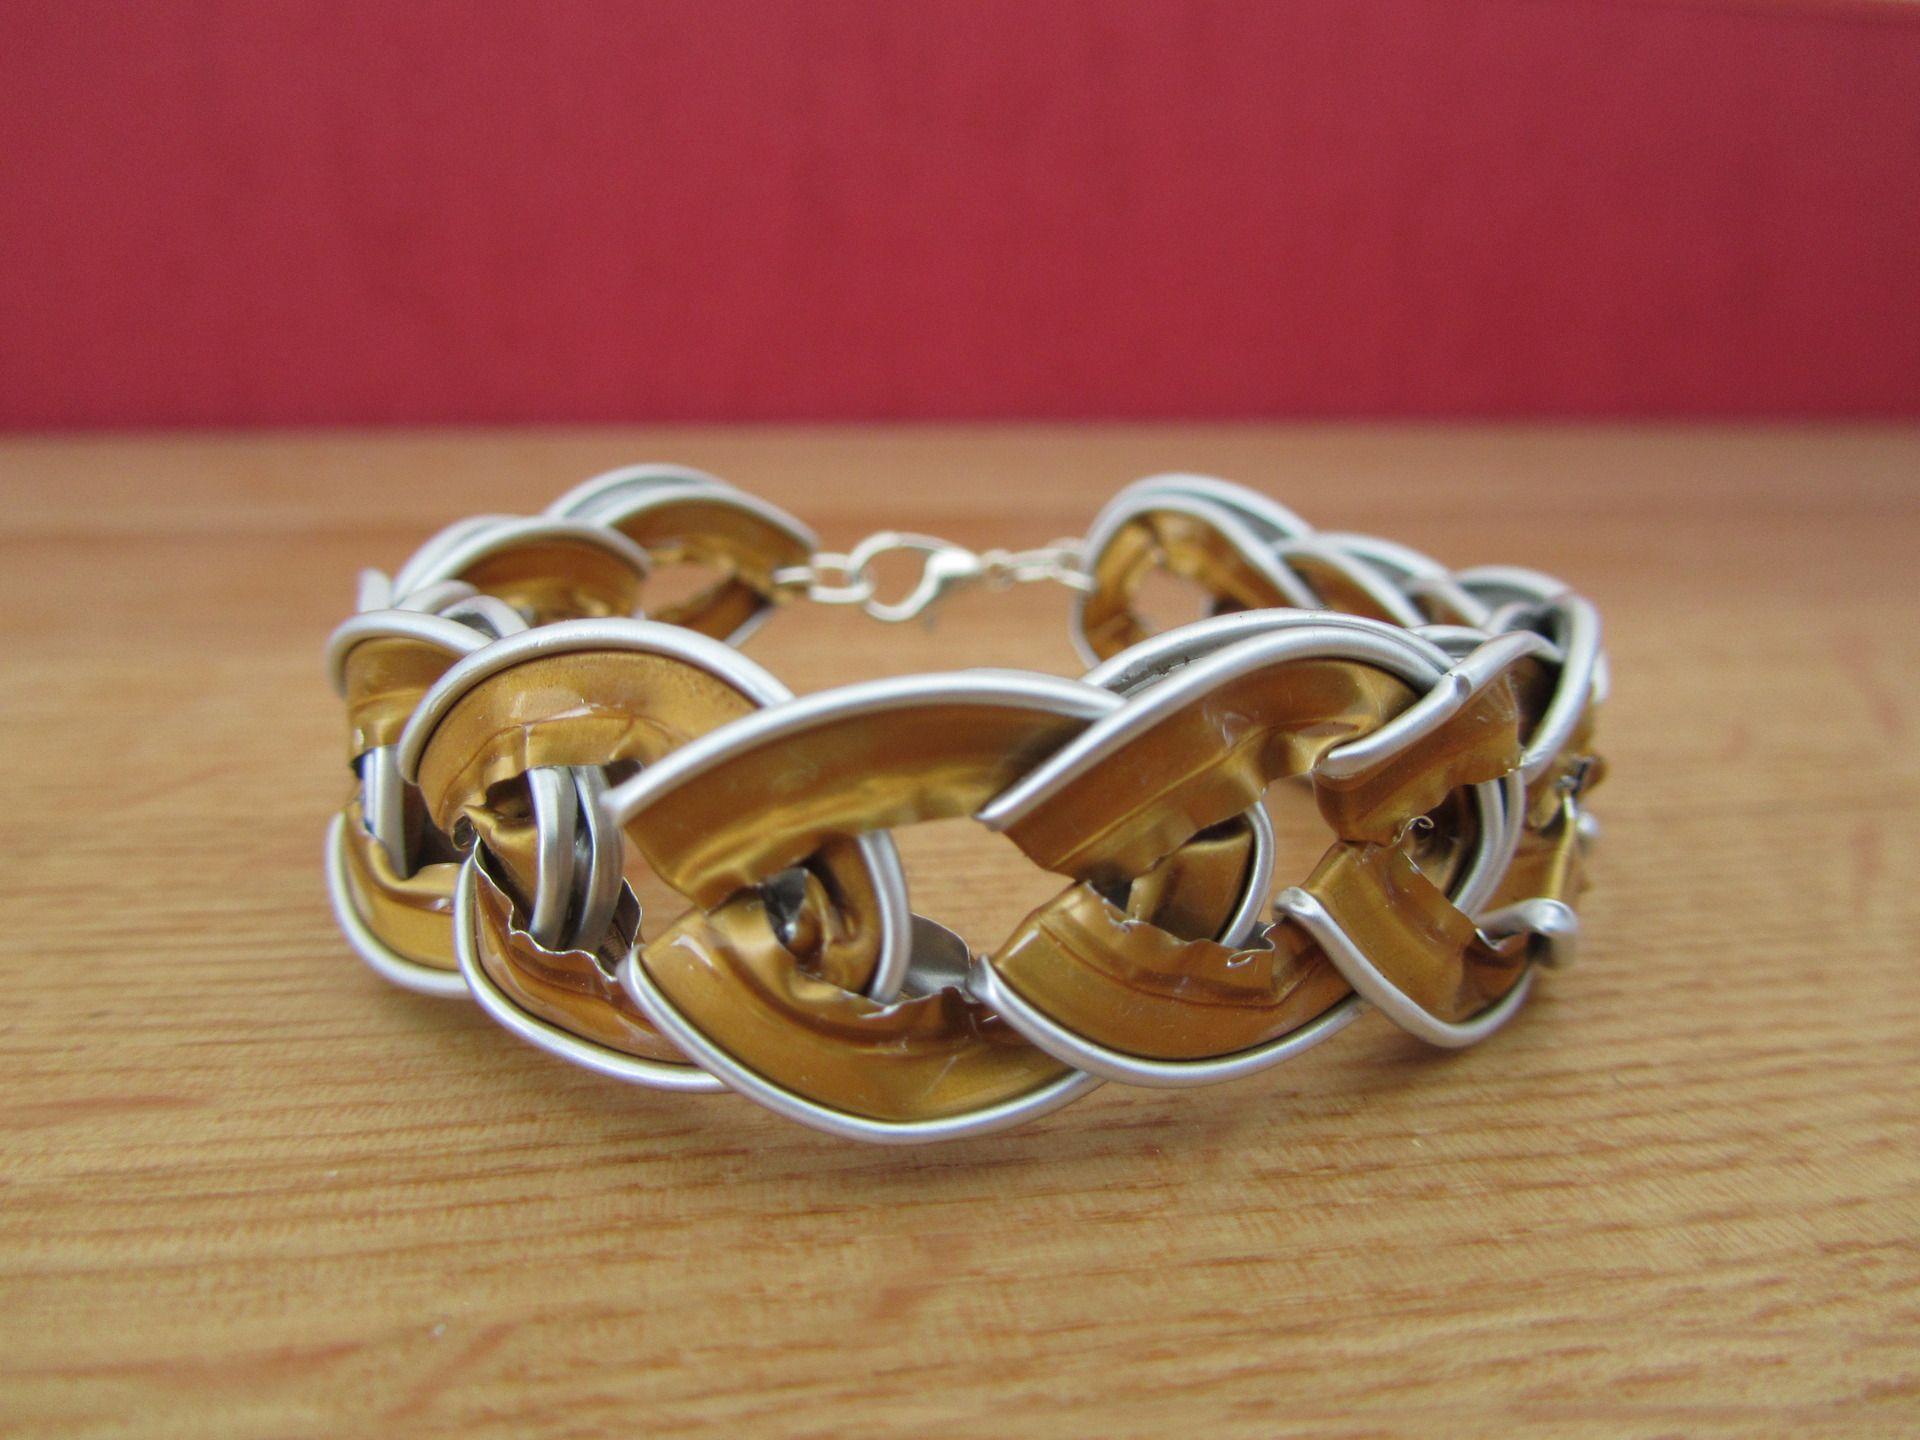 bracelet fantaisie capsules nespresso couleur dor bracelet par creations lili macaron cj. Black Bedroom Furniture Sets. Home Design Ideas